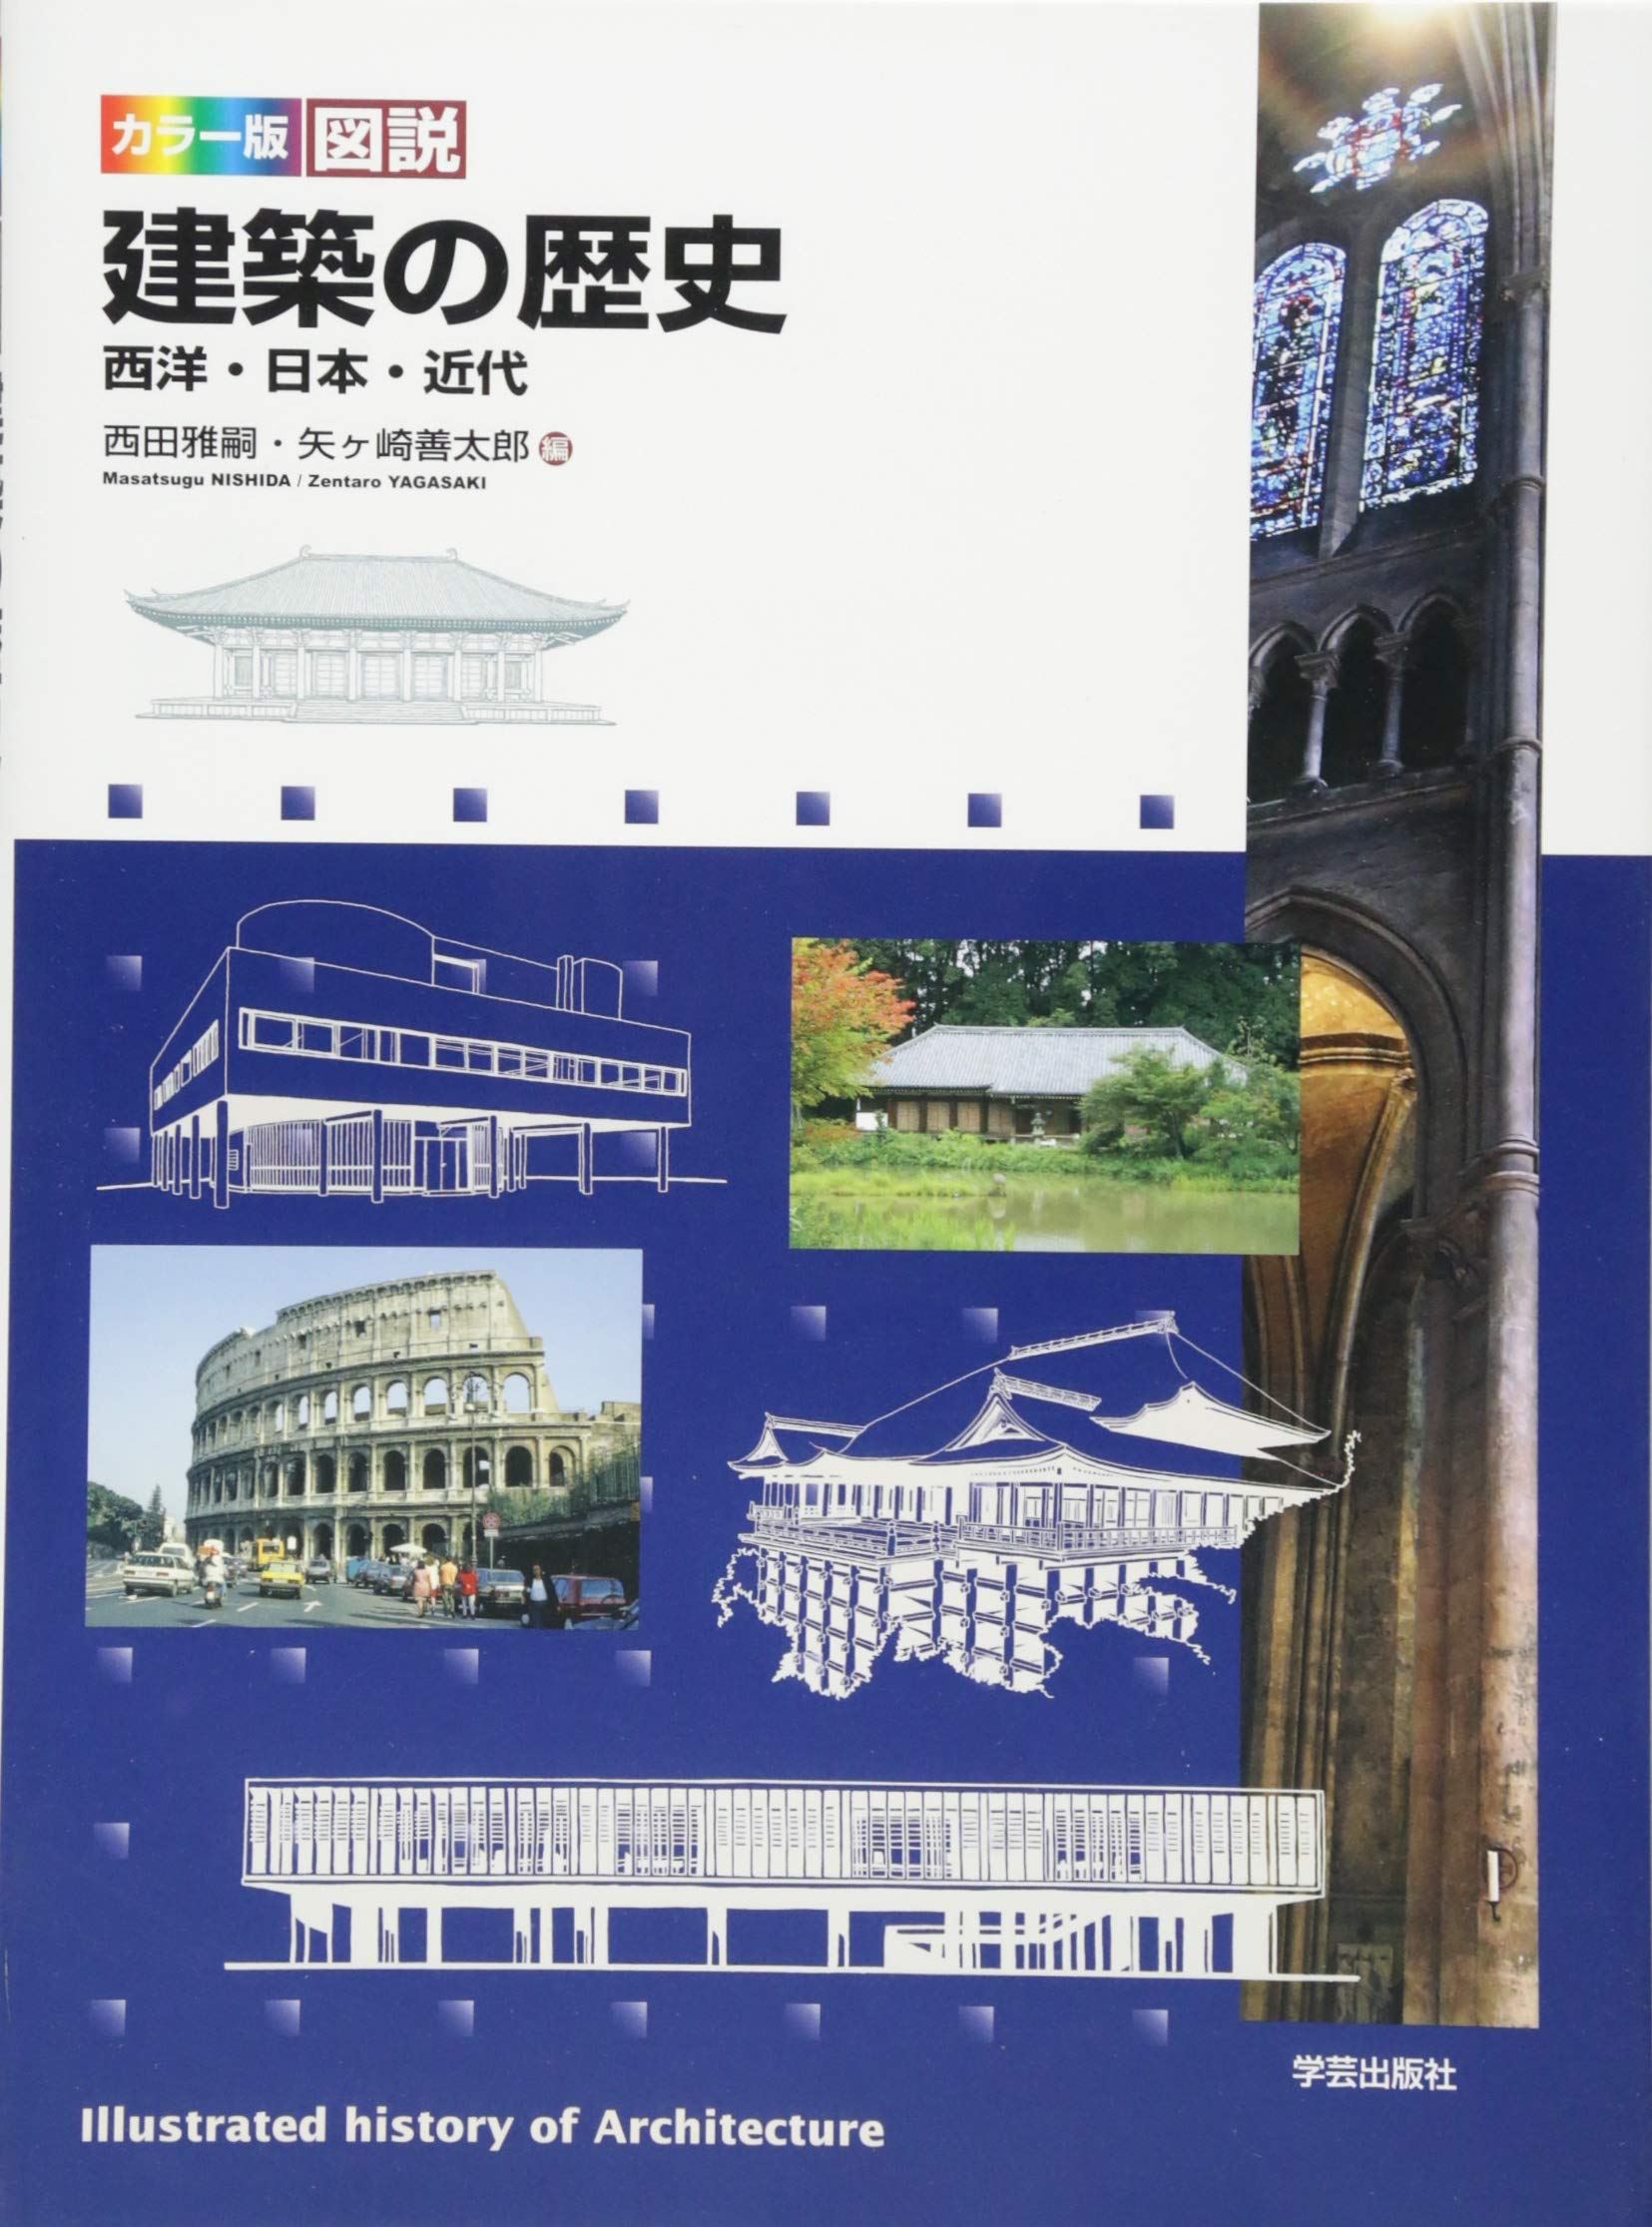 カラー版 図説 建築の歴史 西洋・日本・近代